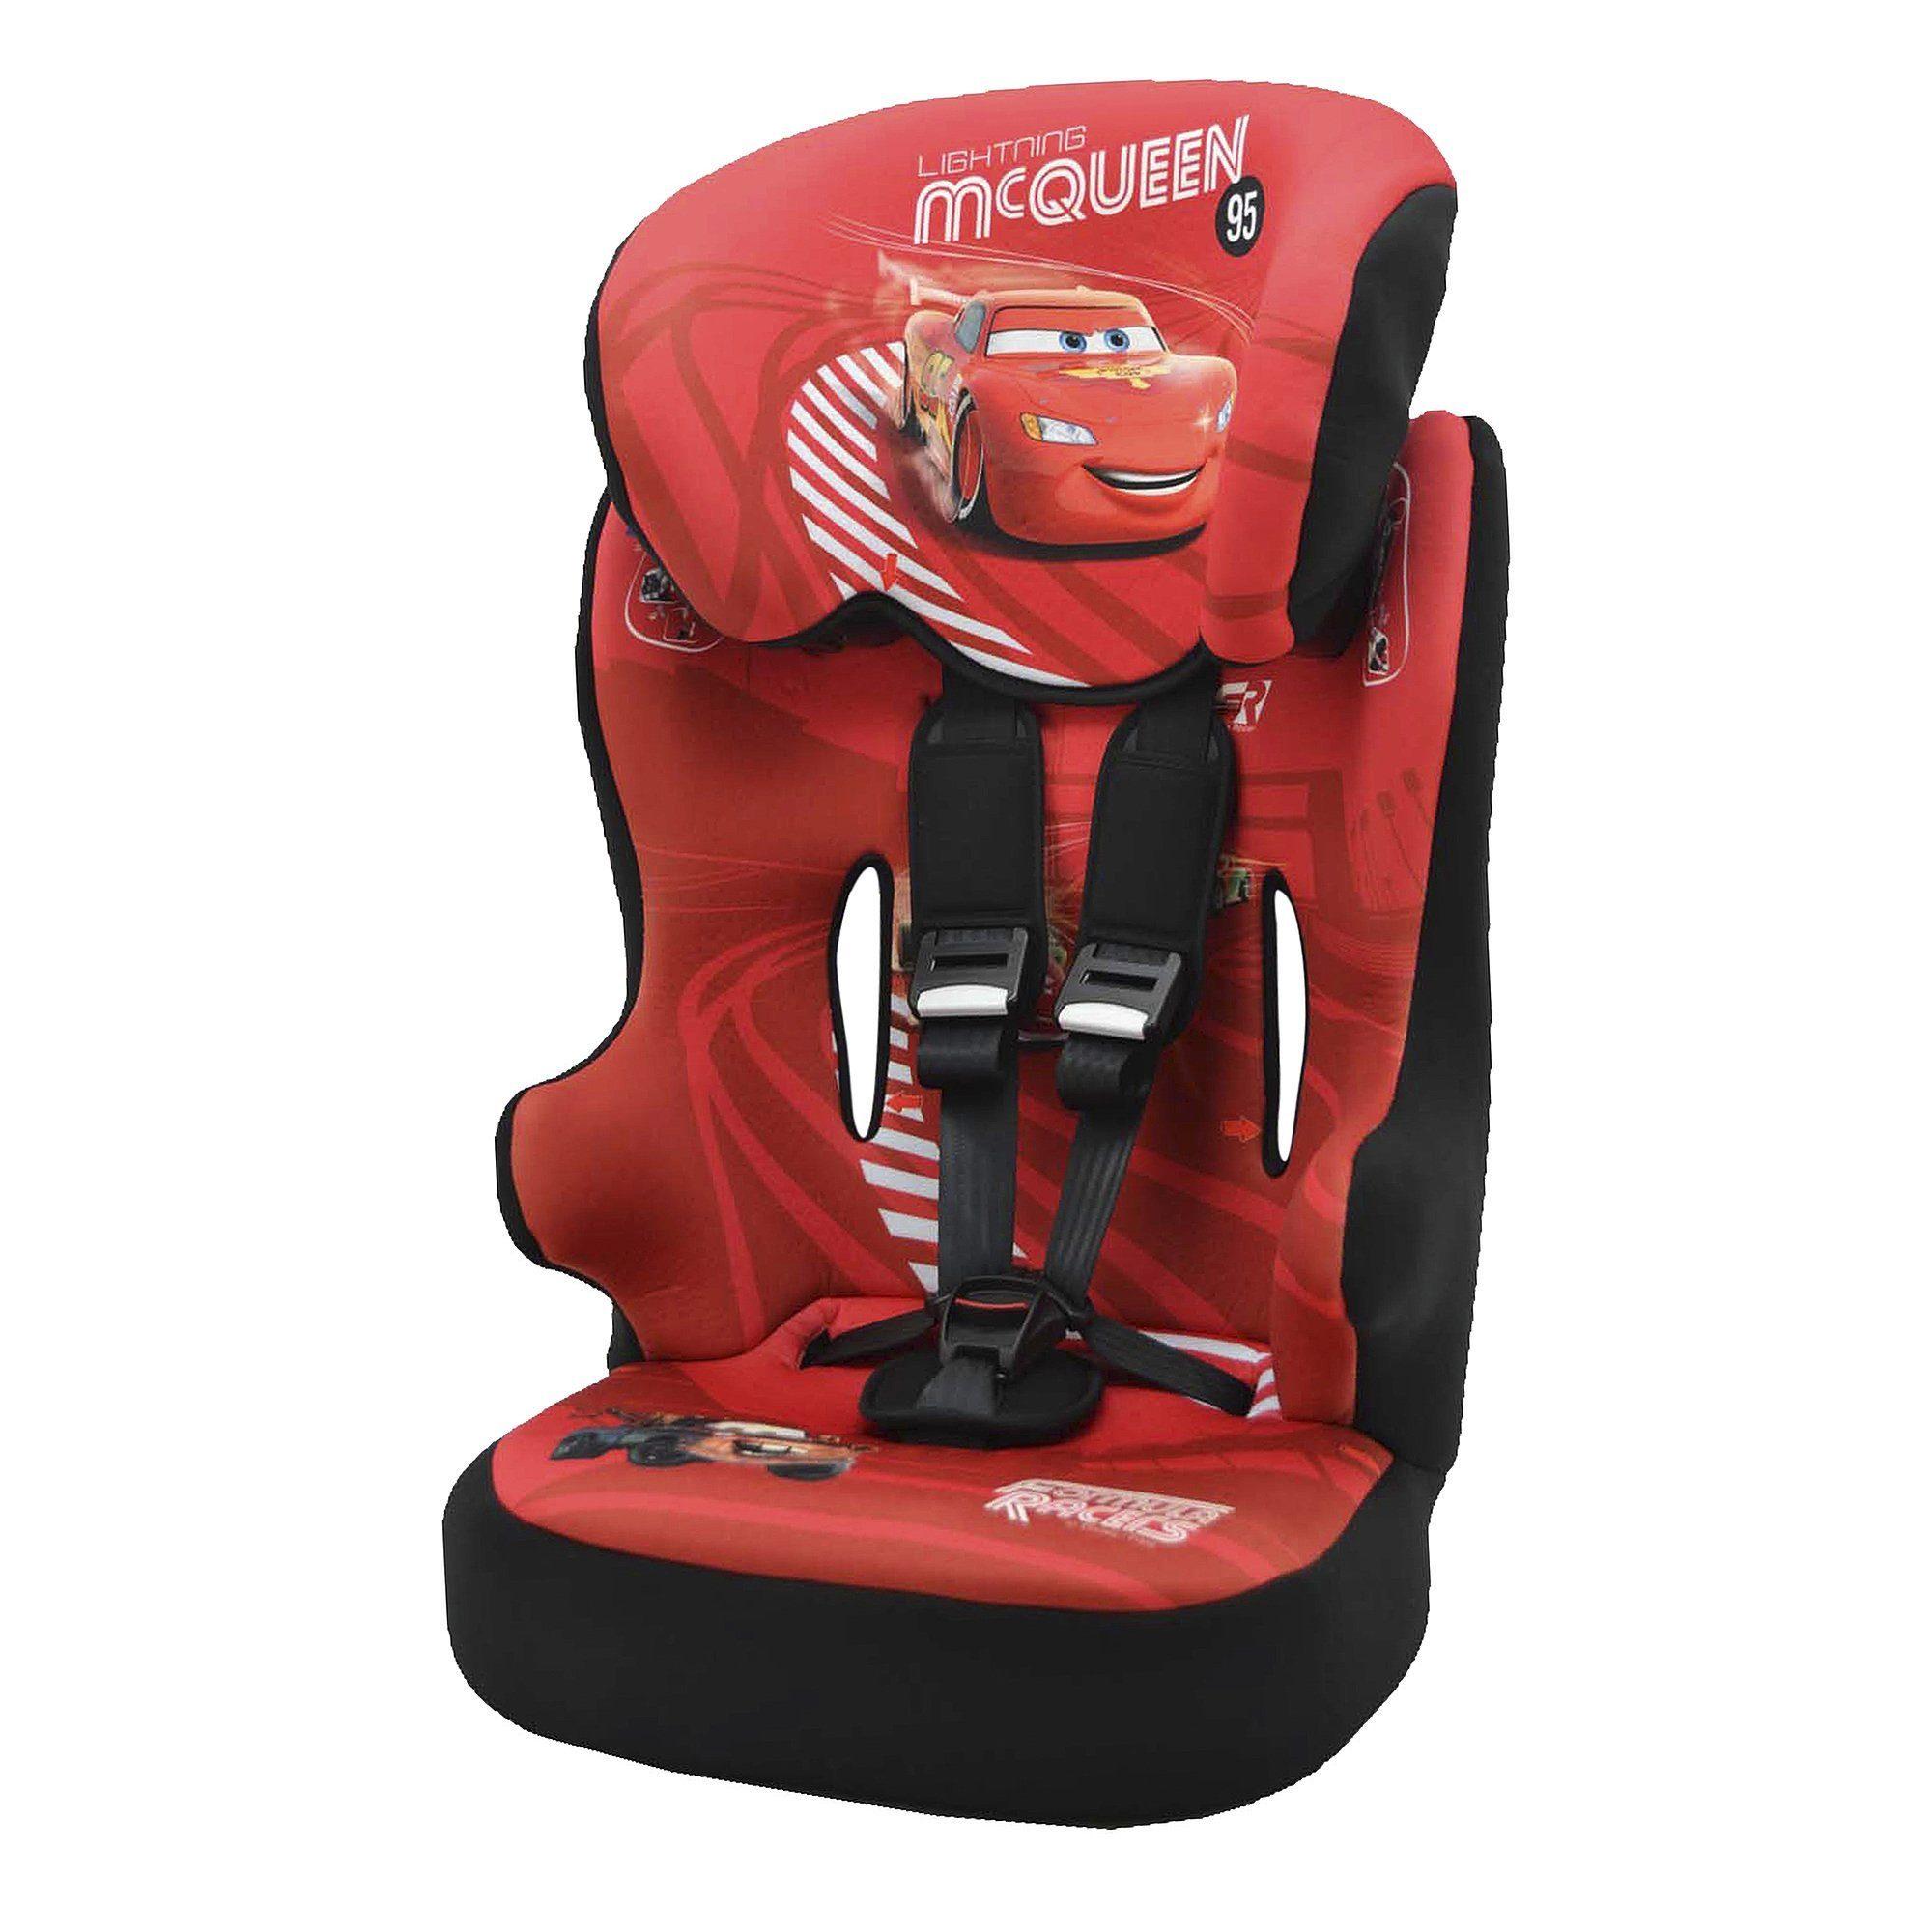 OSANN Racer SP Kindersitz